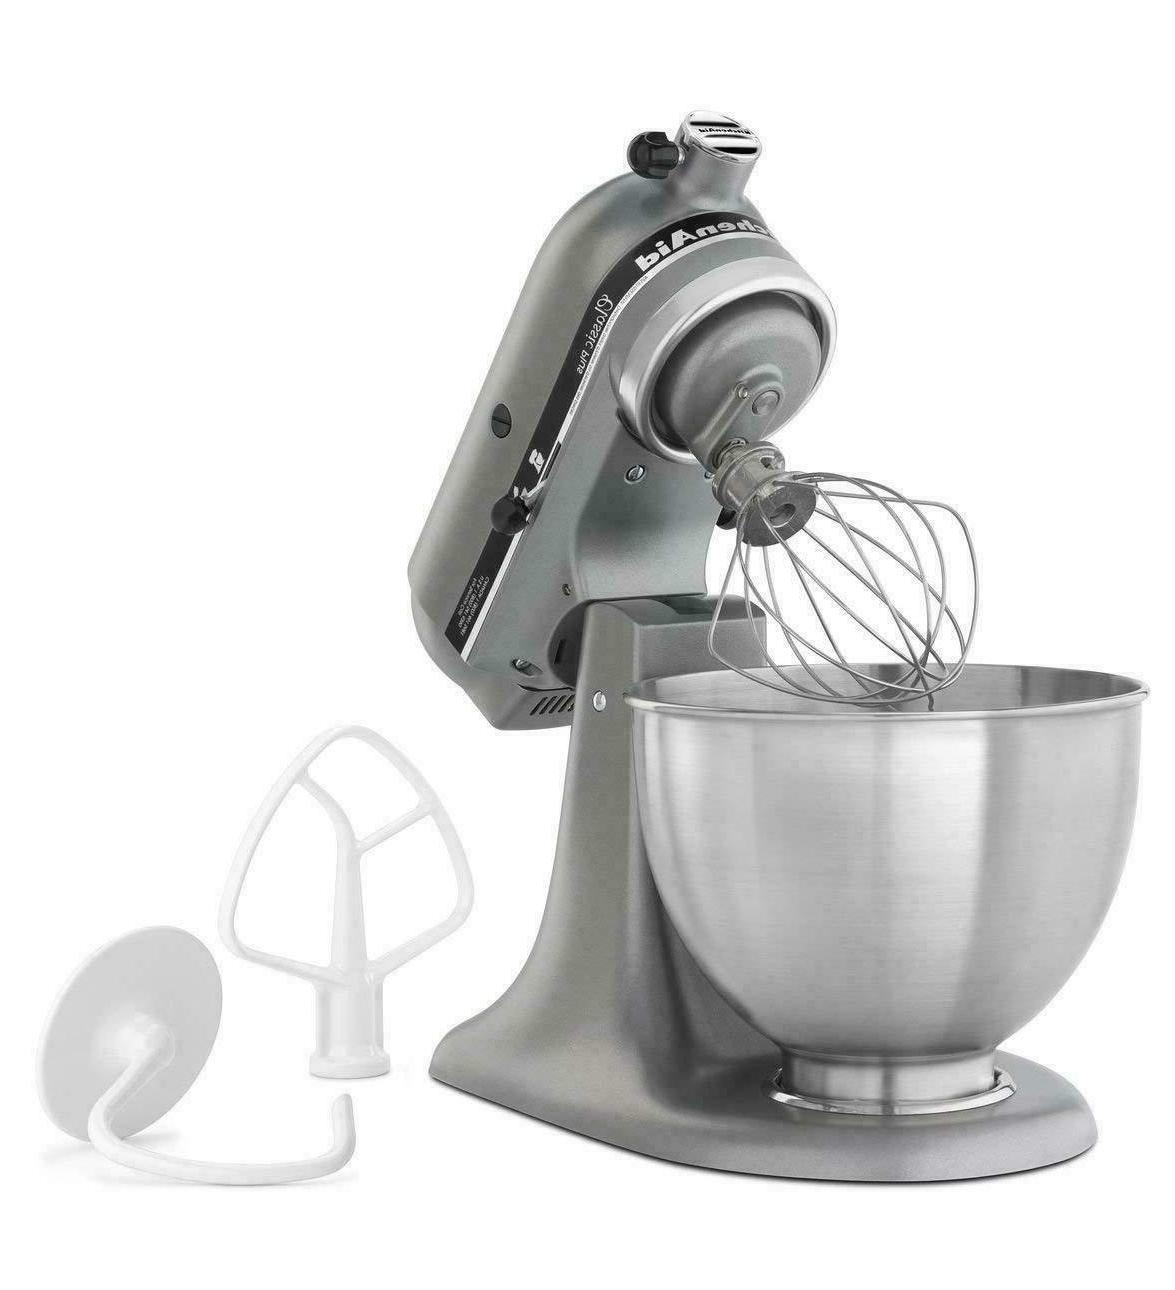 KitchenAid KSM75SL Plus 4.5-Qt. Mixer, Silver